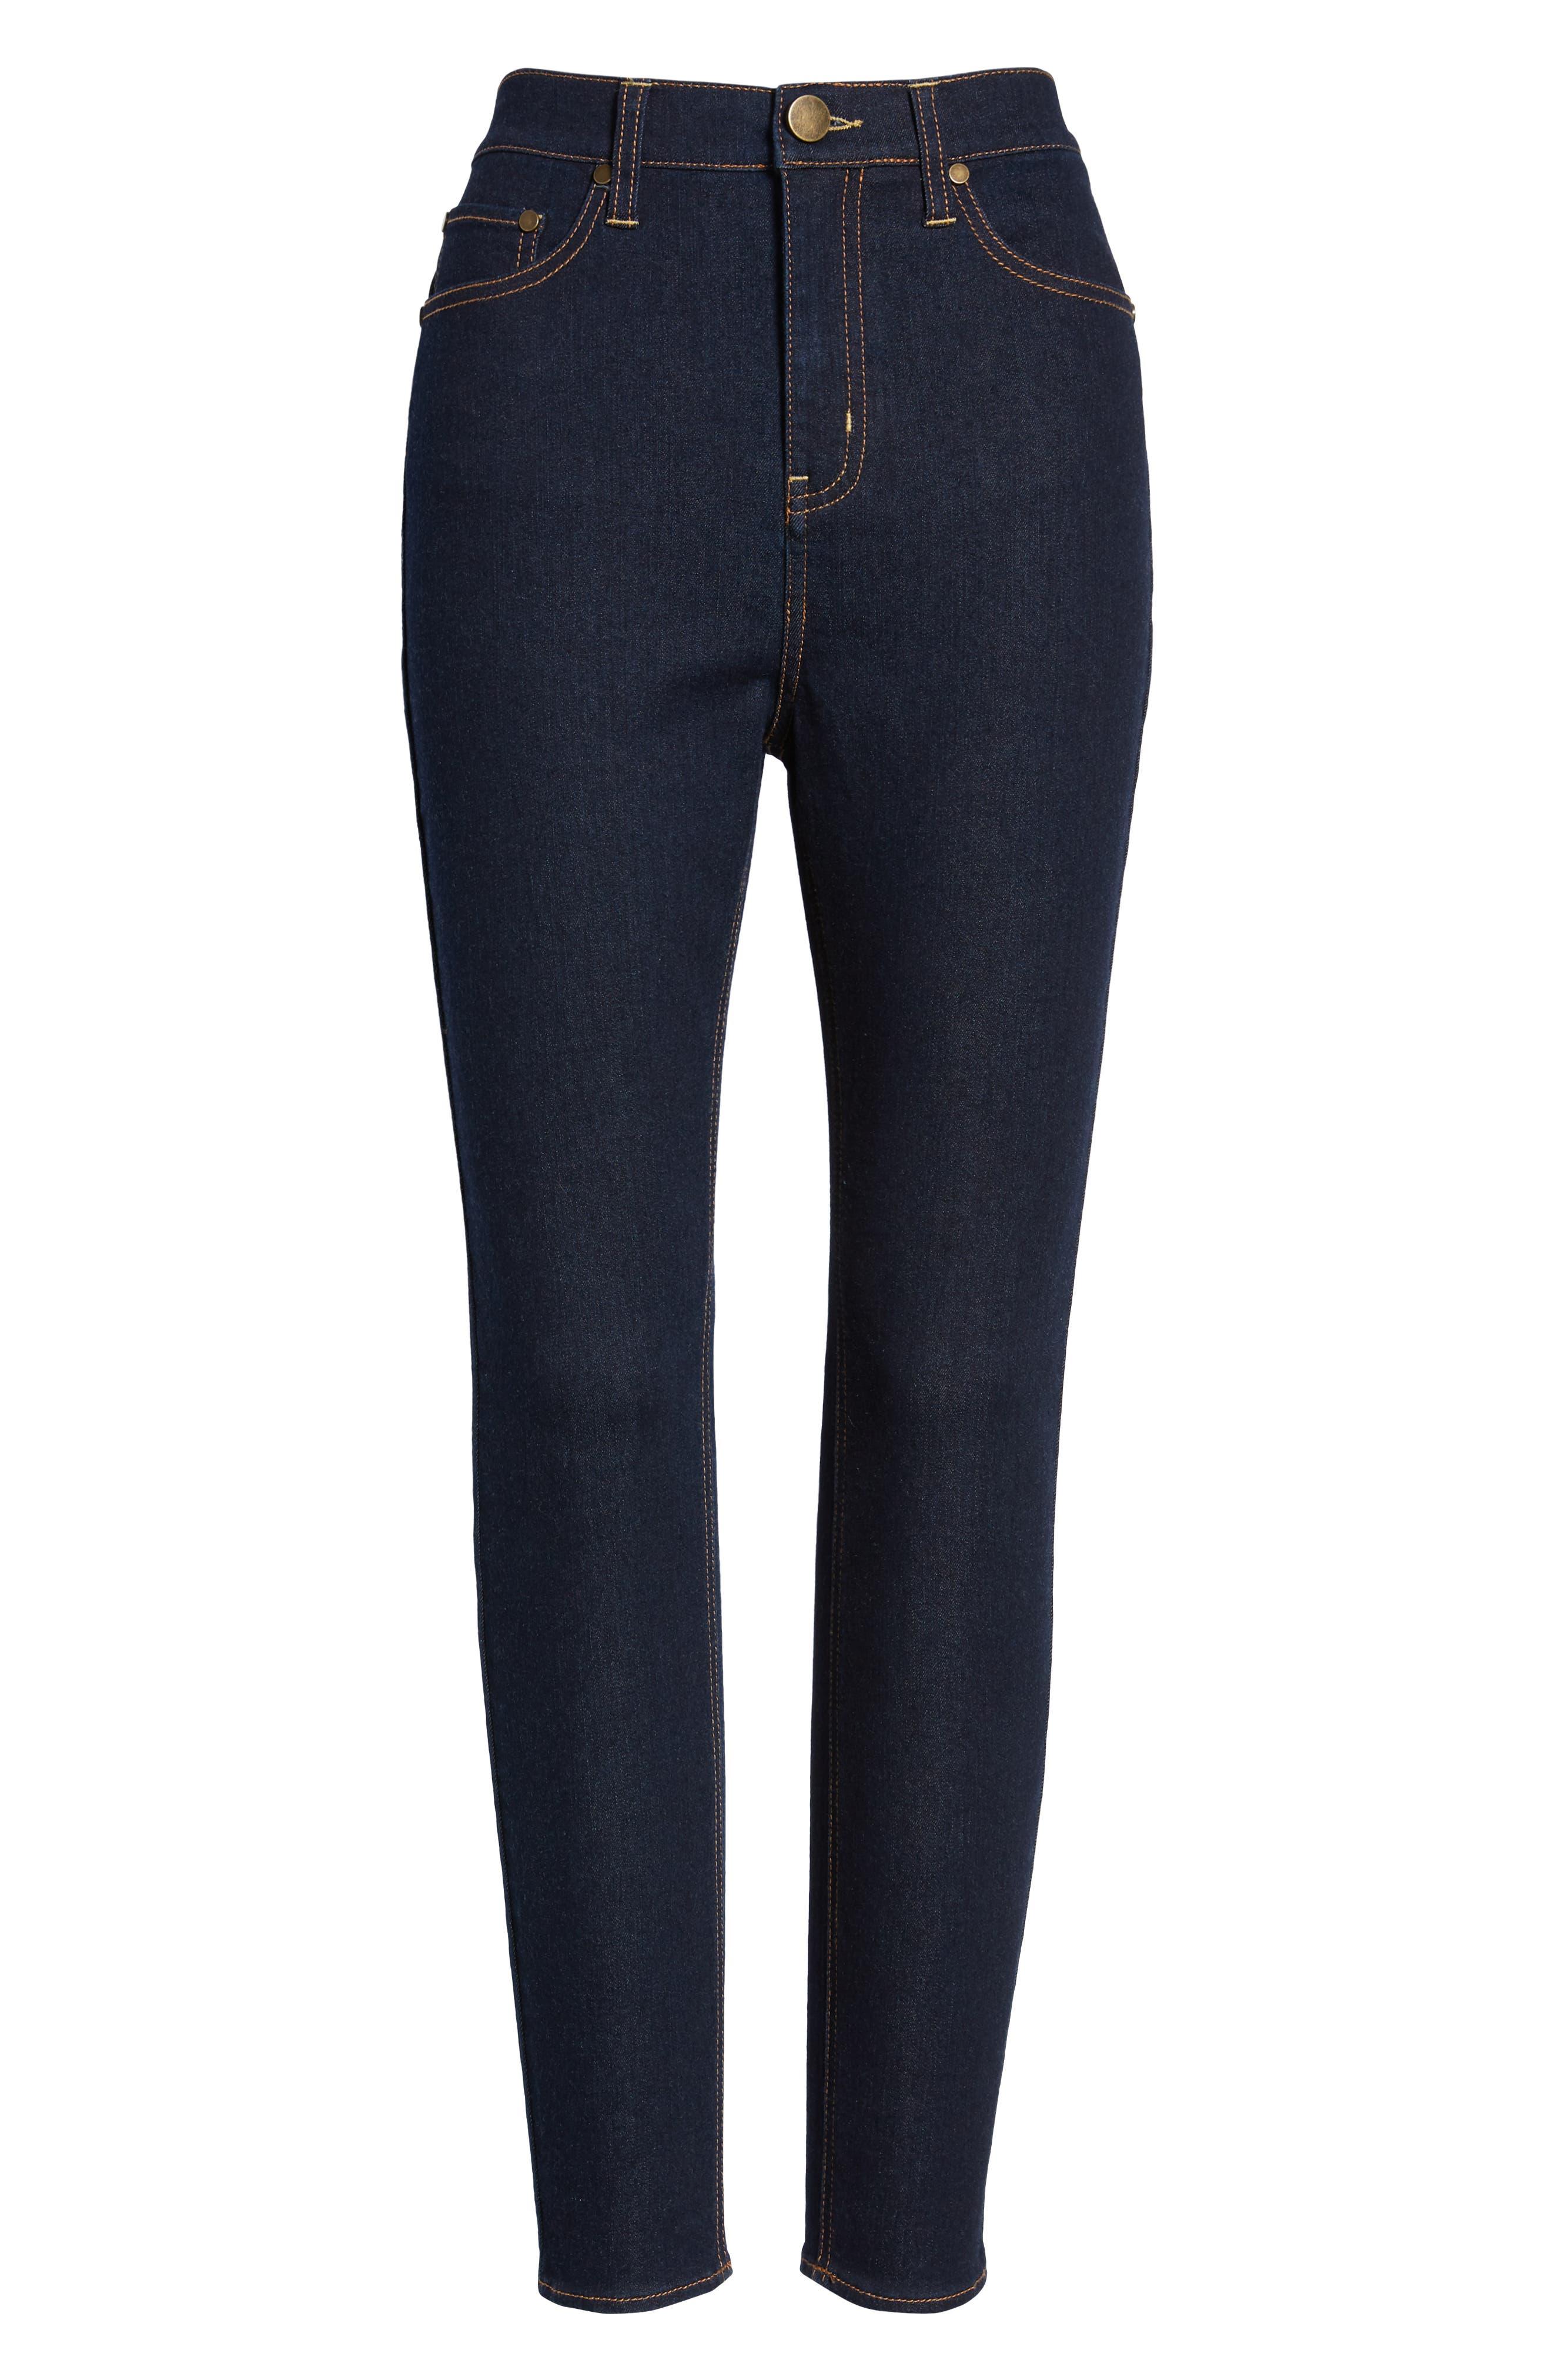 TINSEL, High Waist Skinny Jeans, Alternate thumbnail 7, color, 401